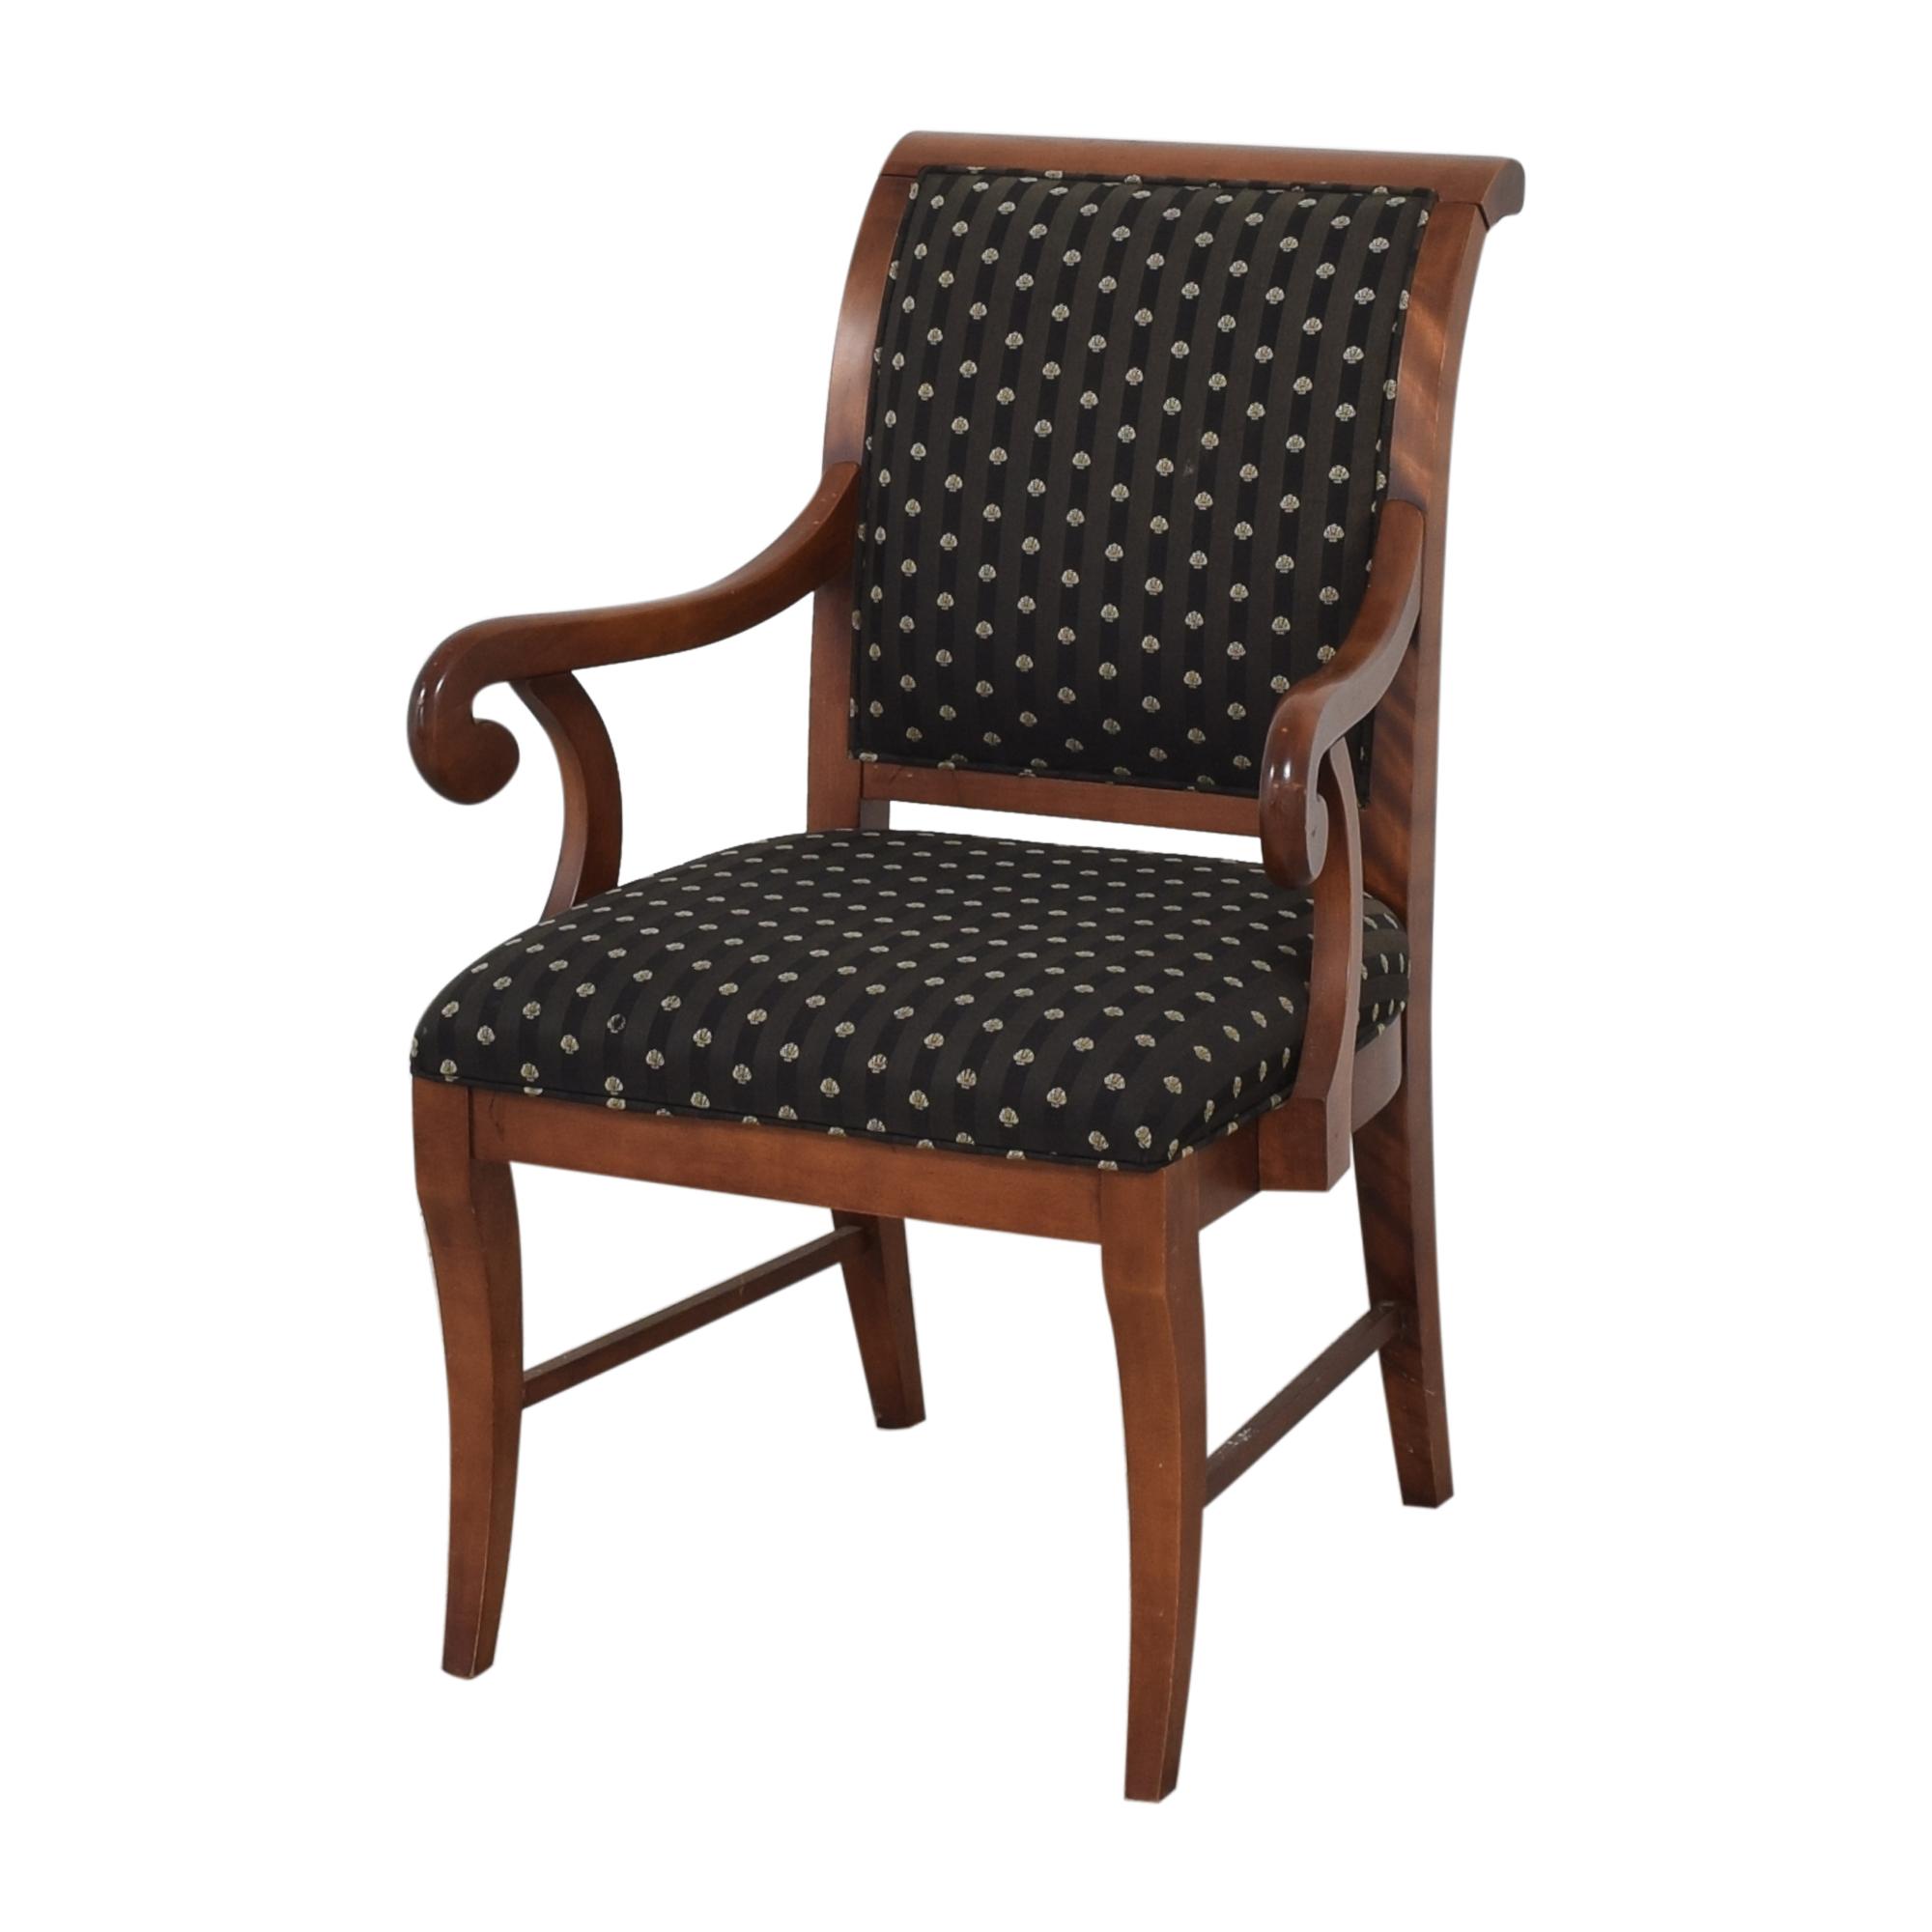 Leda Furniture Leda Furniture Arm Chairs price